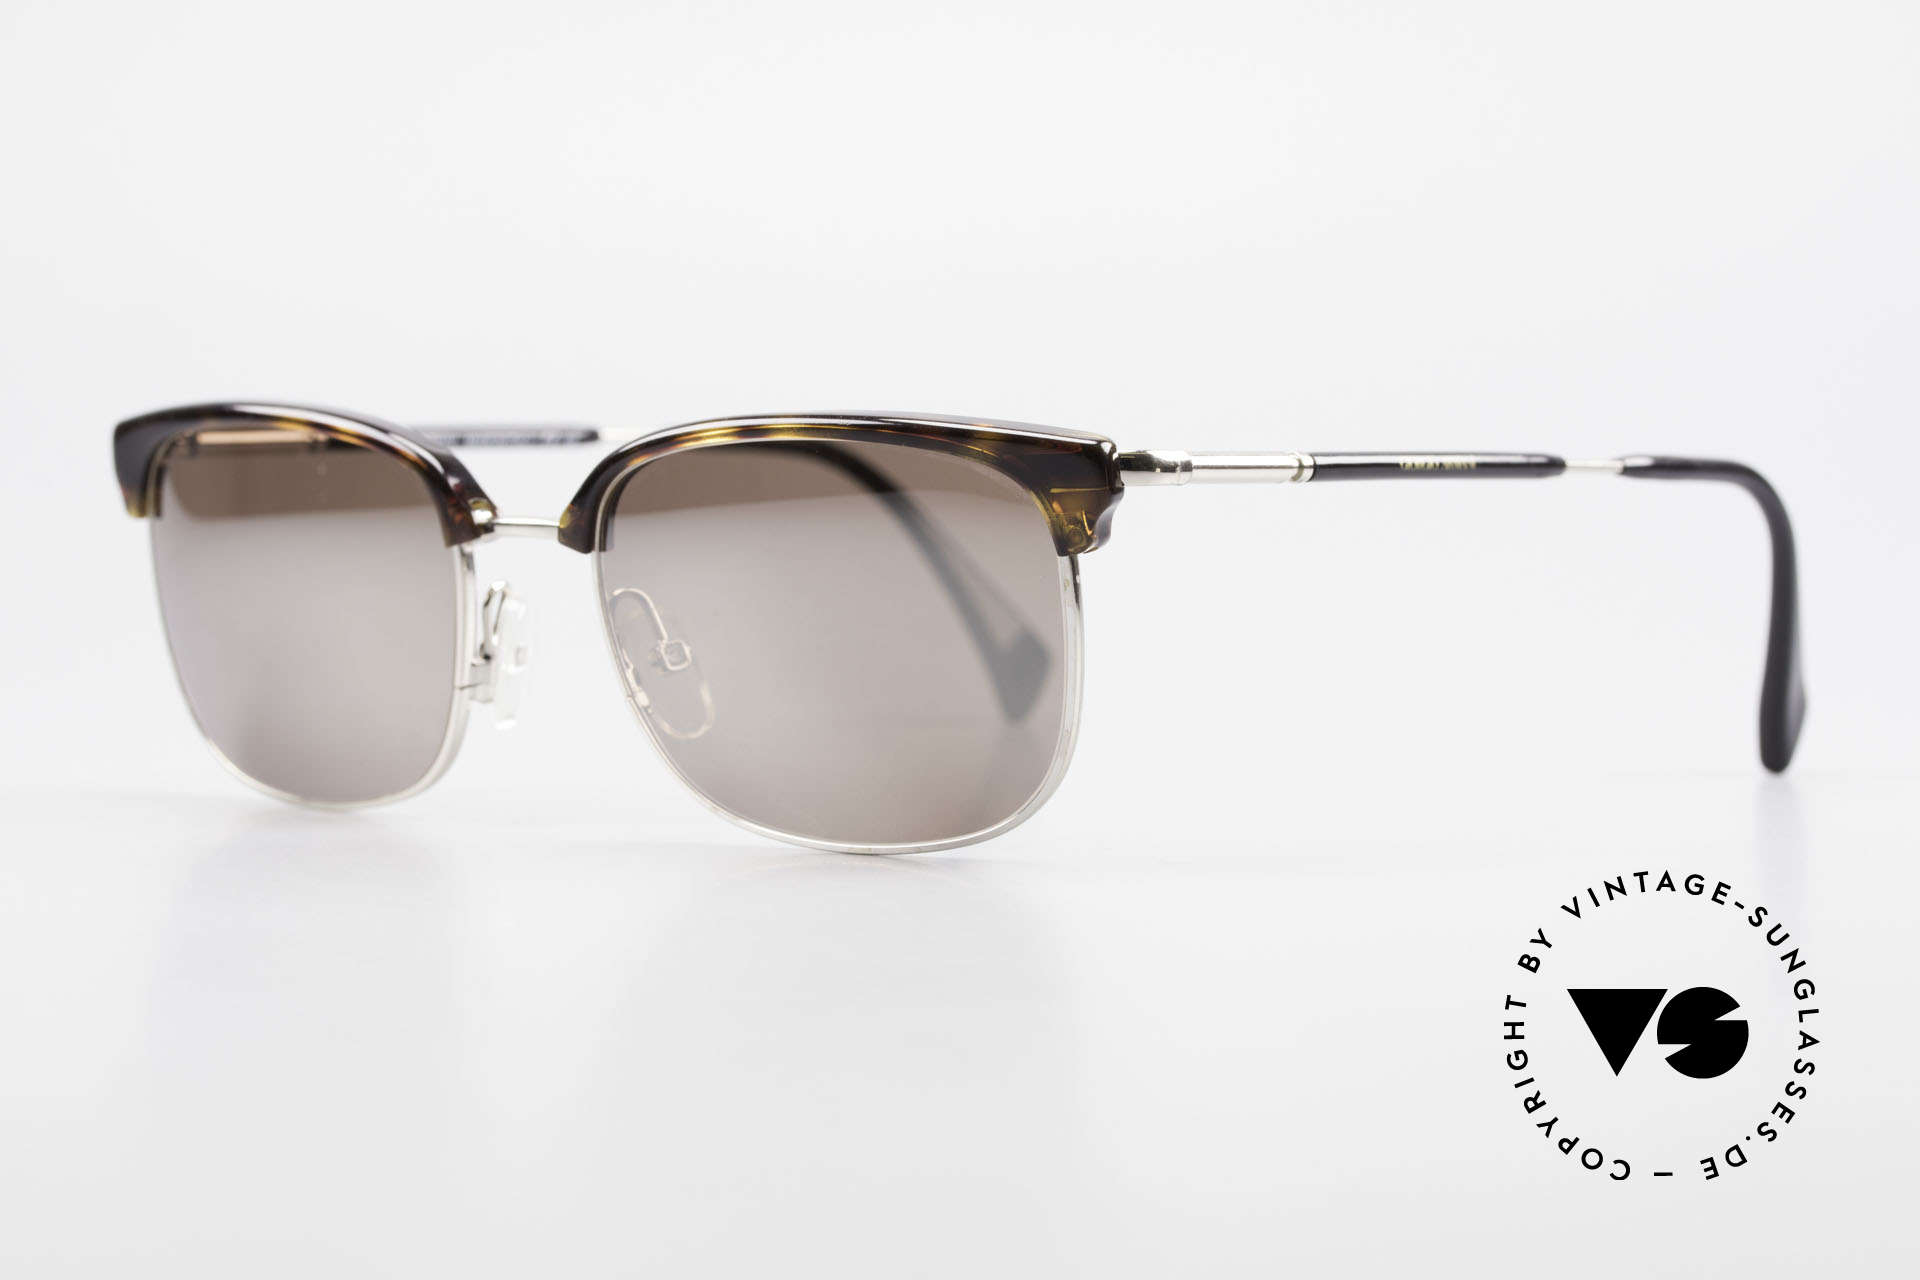 Giorgio Armani 788 Square Panto Sunglasses Men, silver / tortoise frame with flexible spring hinges, Made for Men